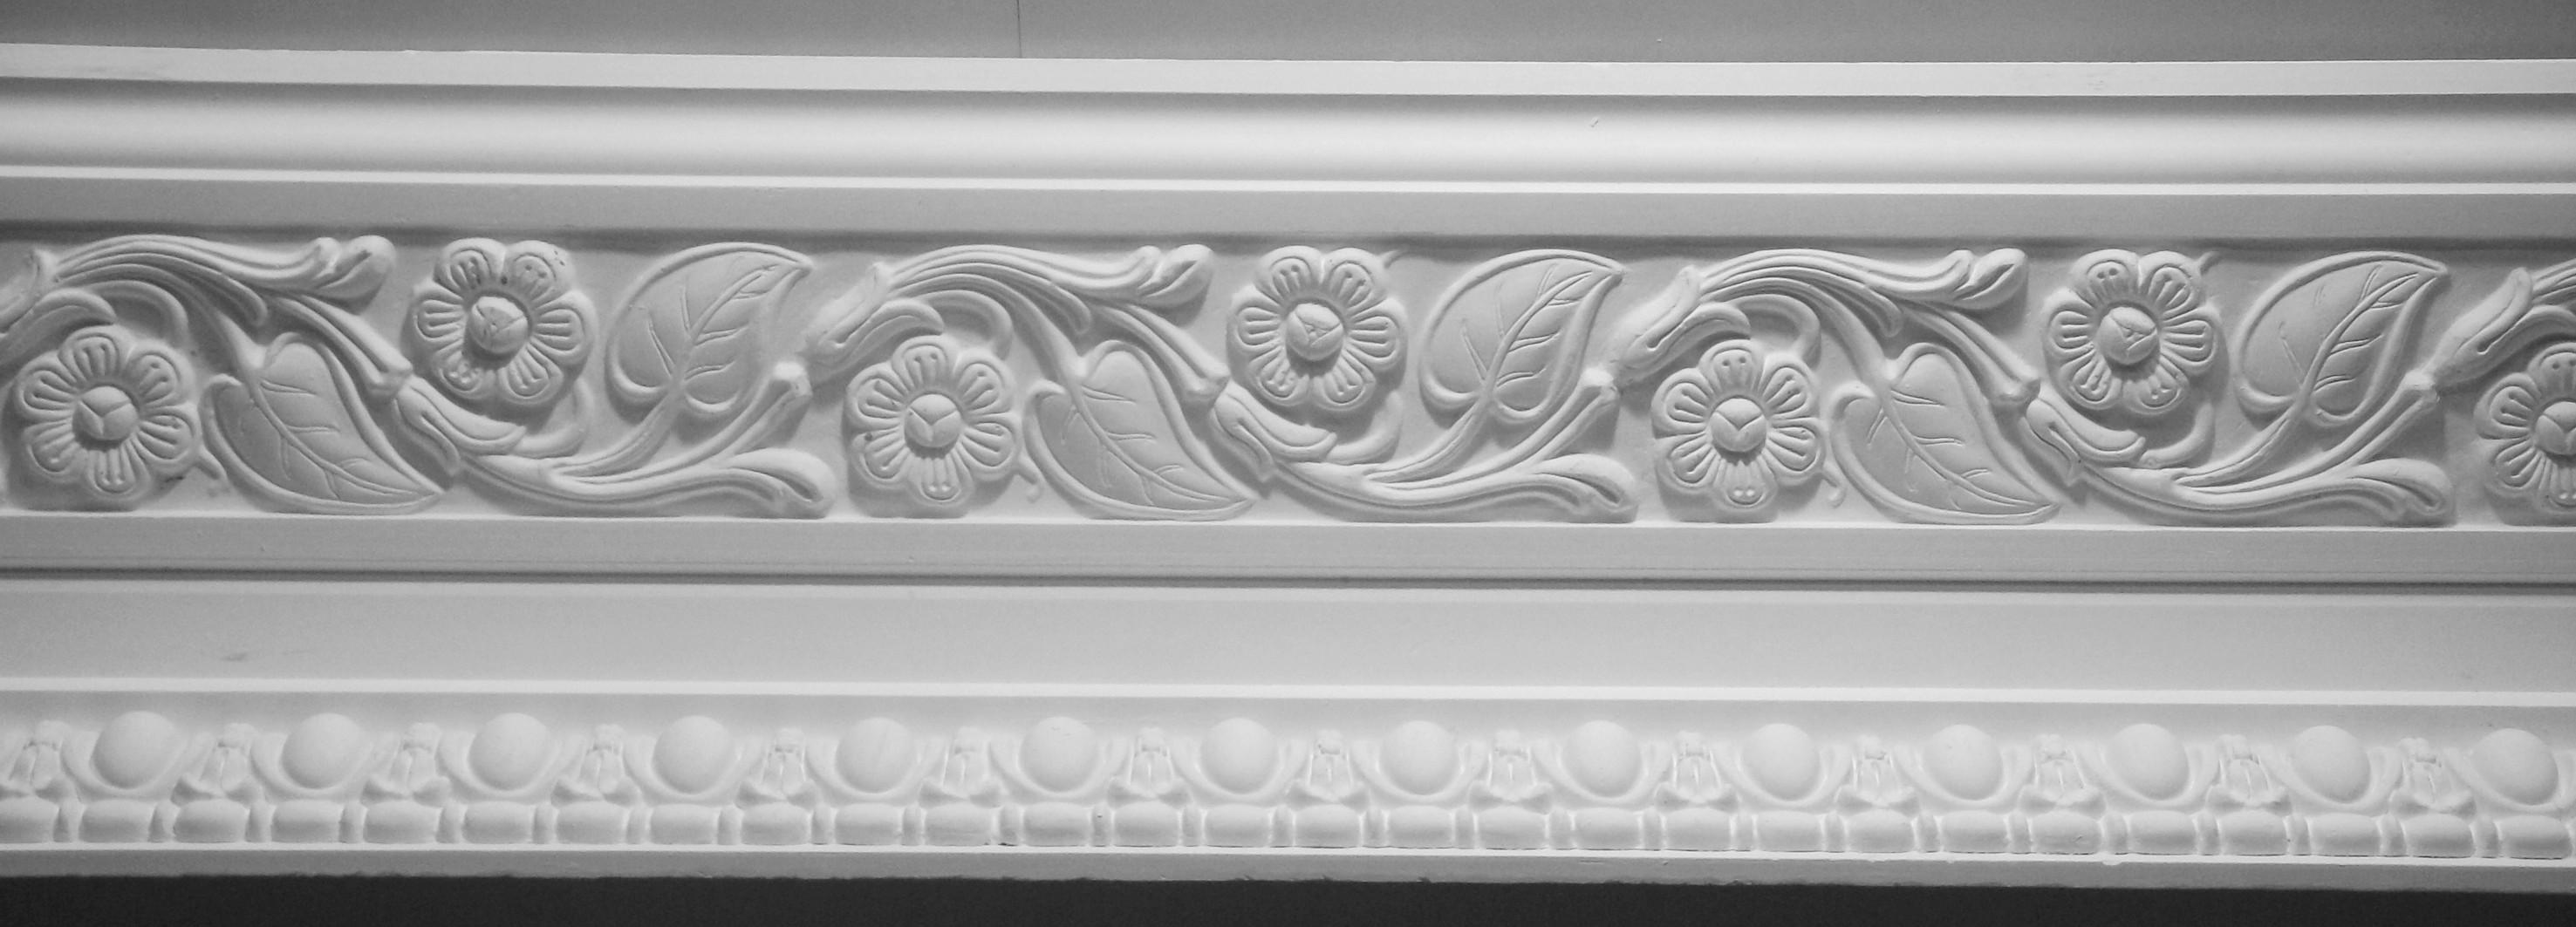 Arts & Crafts Cornices (1910-1920)